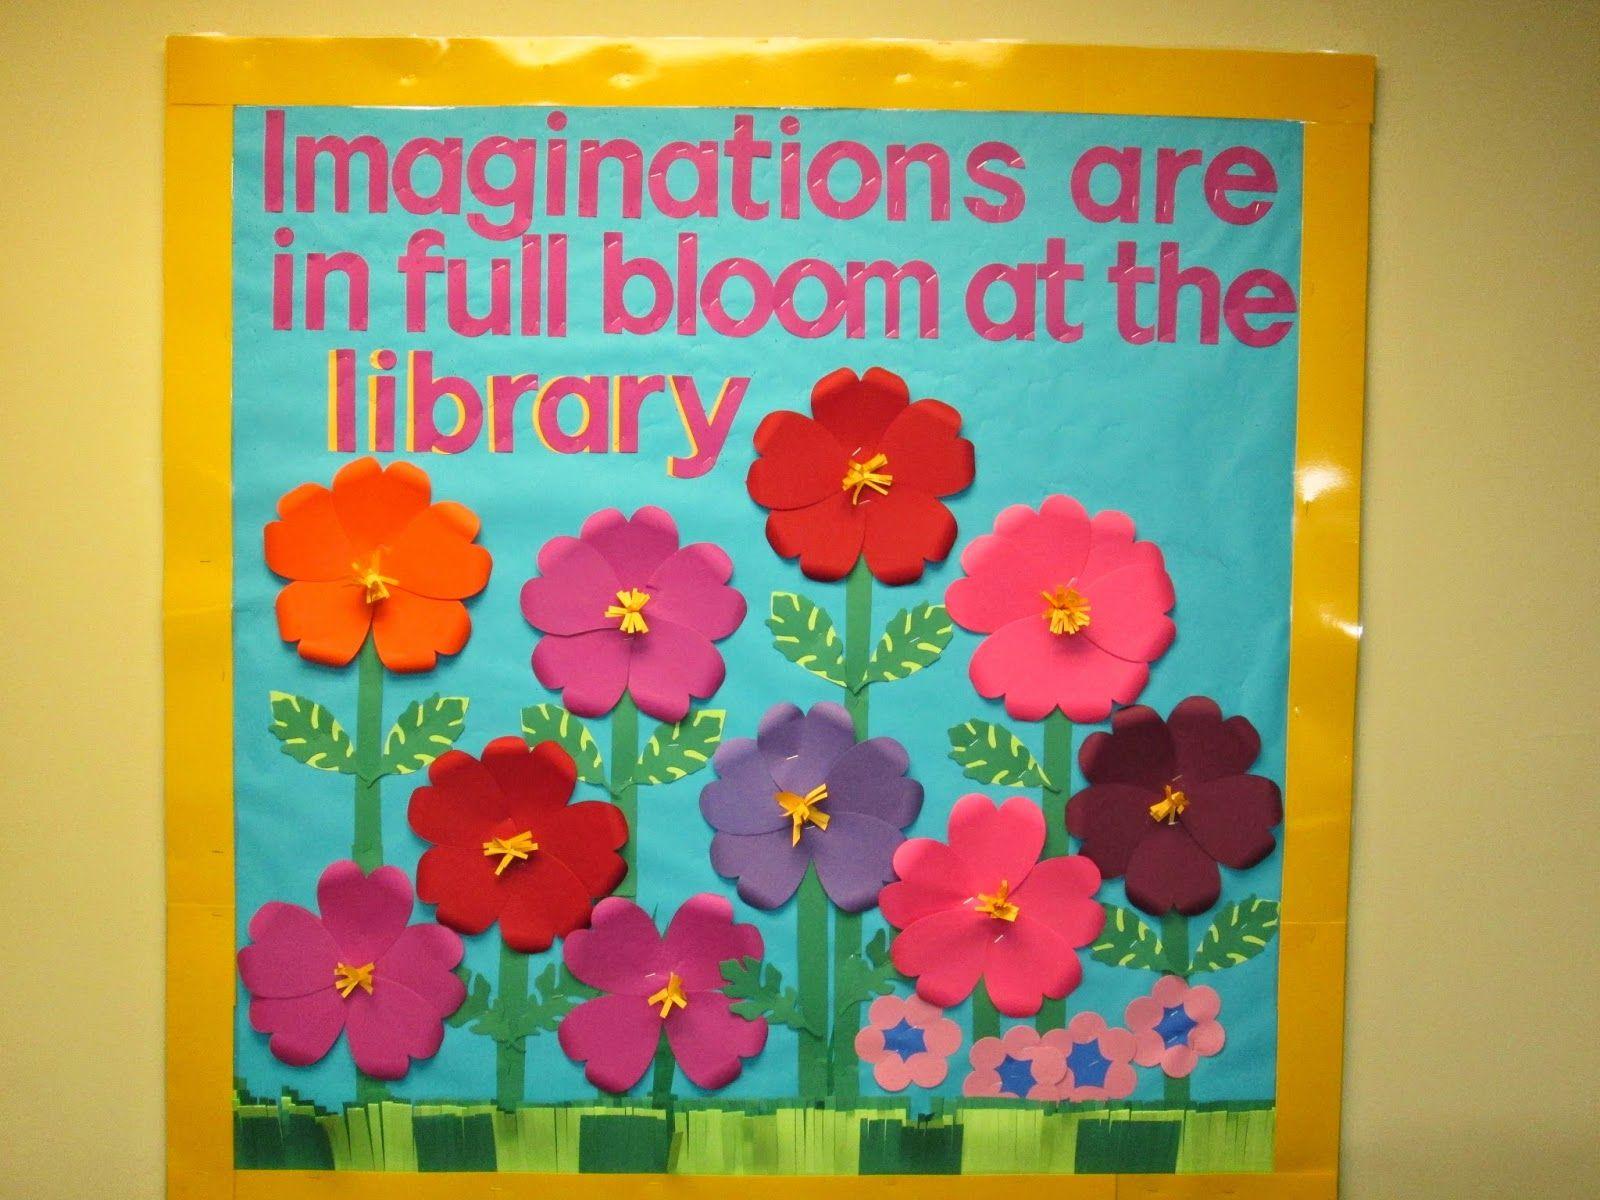 Lorri S School Library Blog School Library Media Center